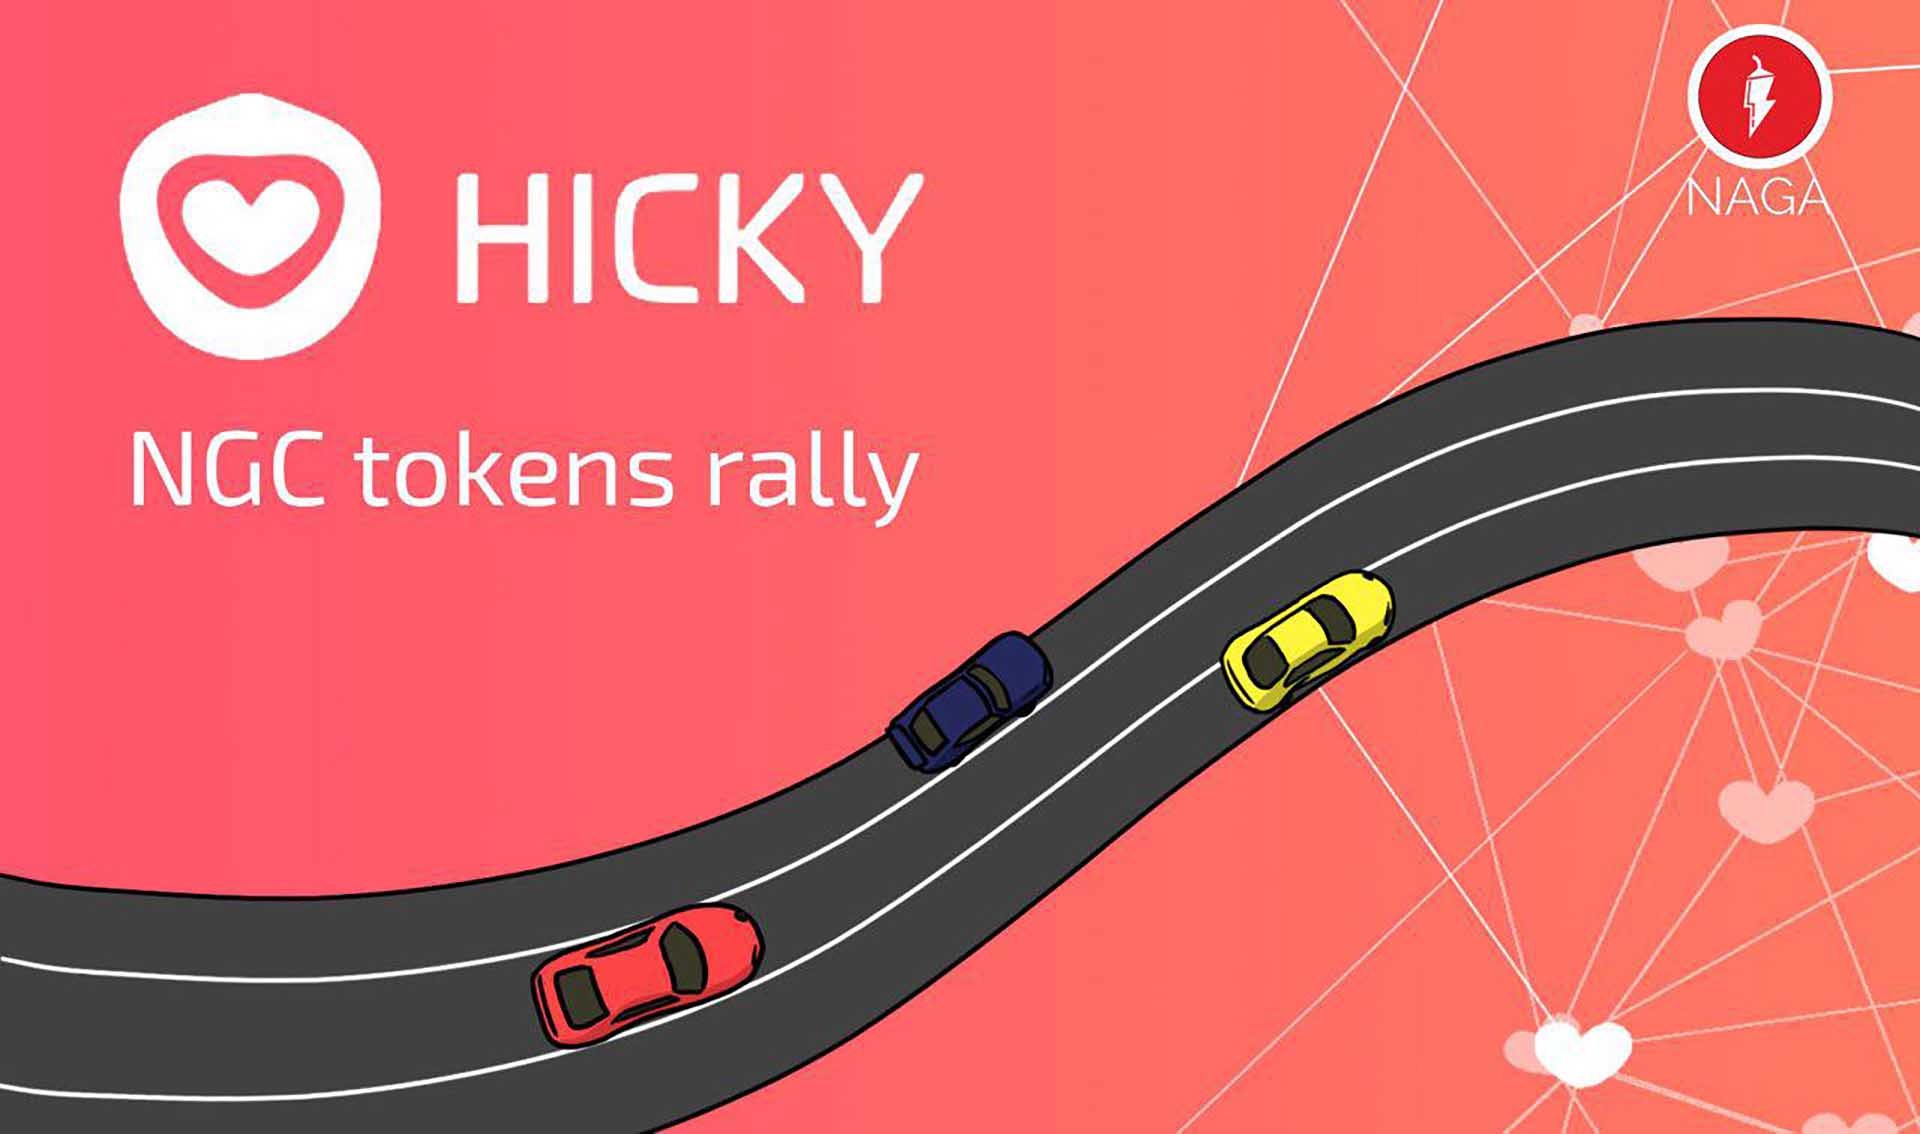 Buy HKY Tokens and Win up to 10K NGC (NAGA TOKENS=1$) for Free!